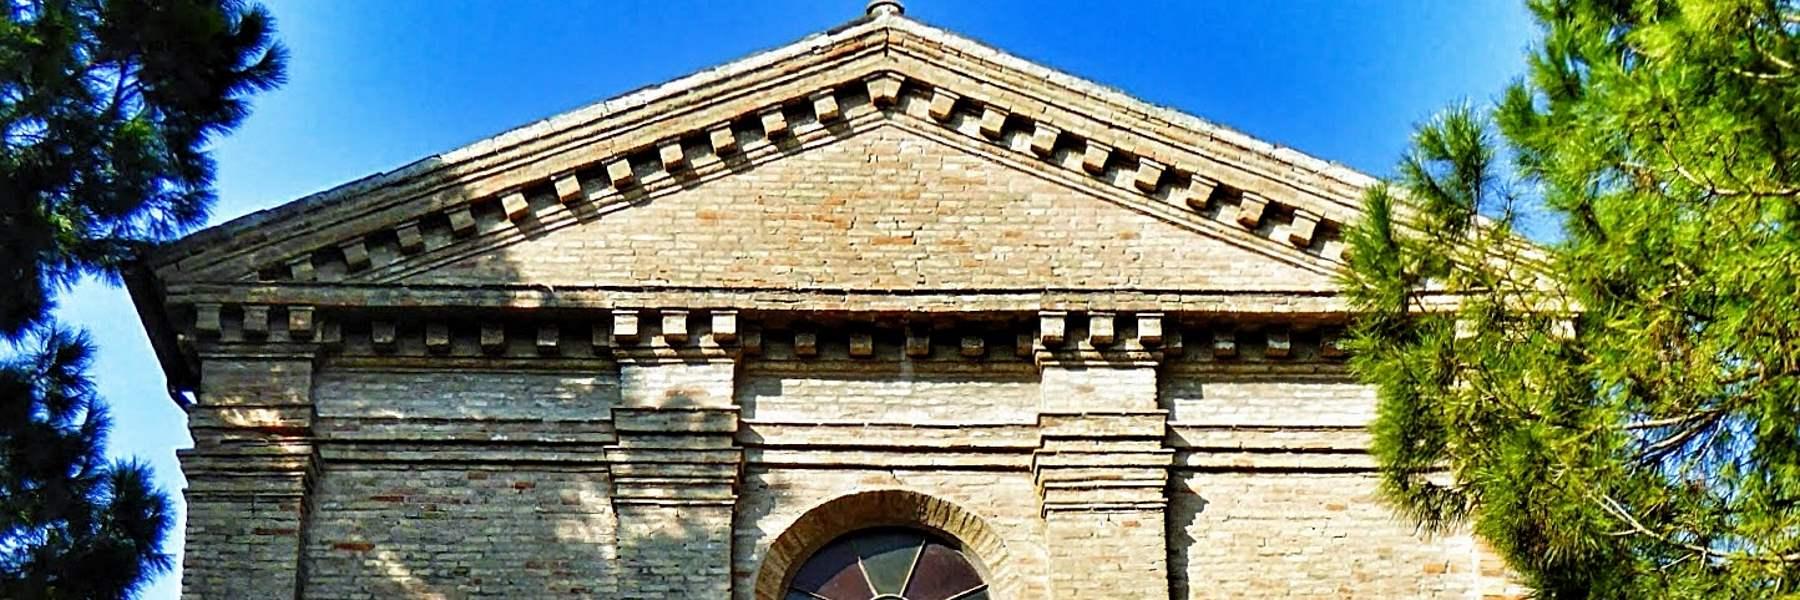 Wallfahrtskirche Madonna degli Angeli